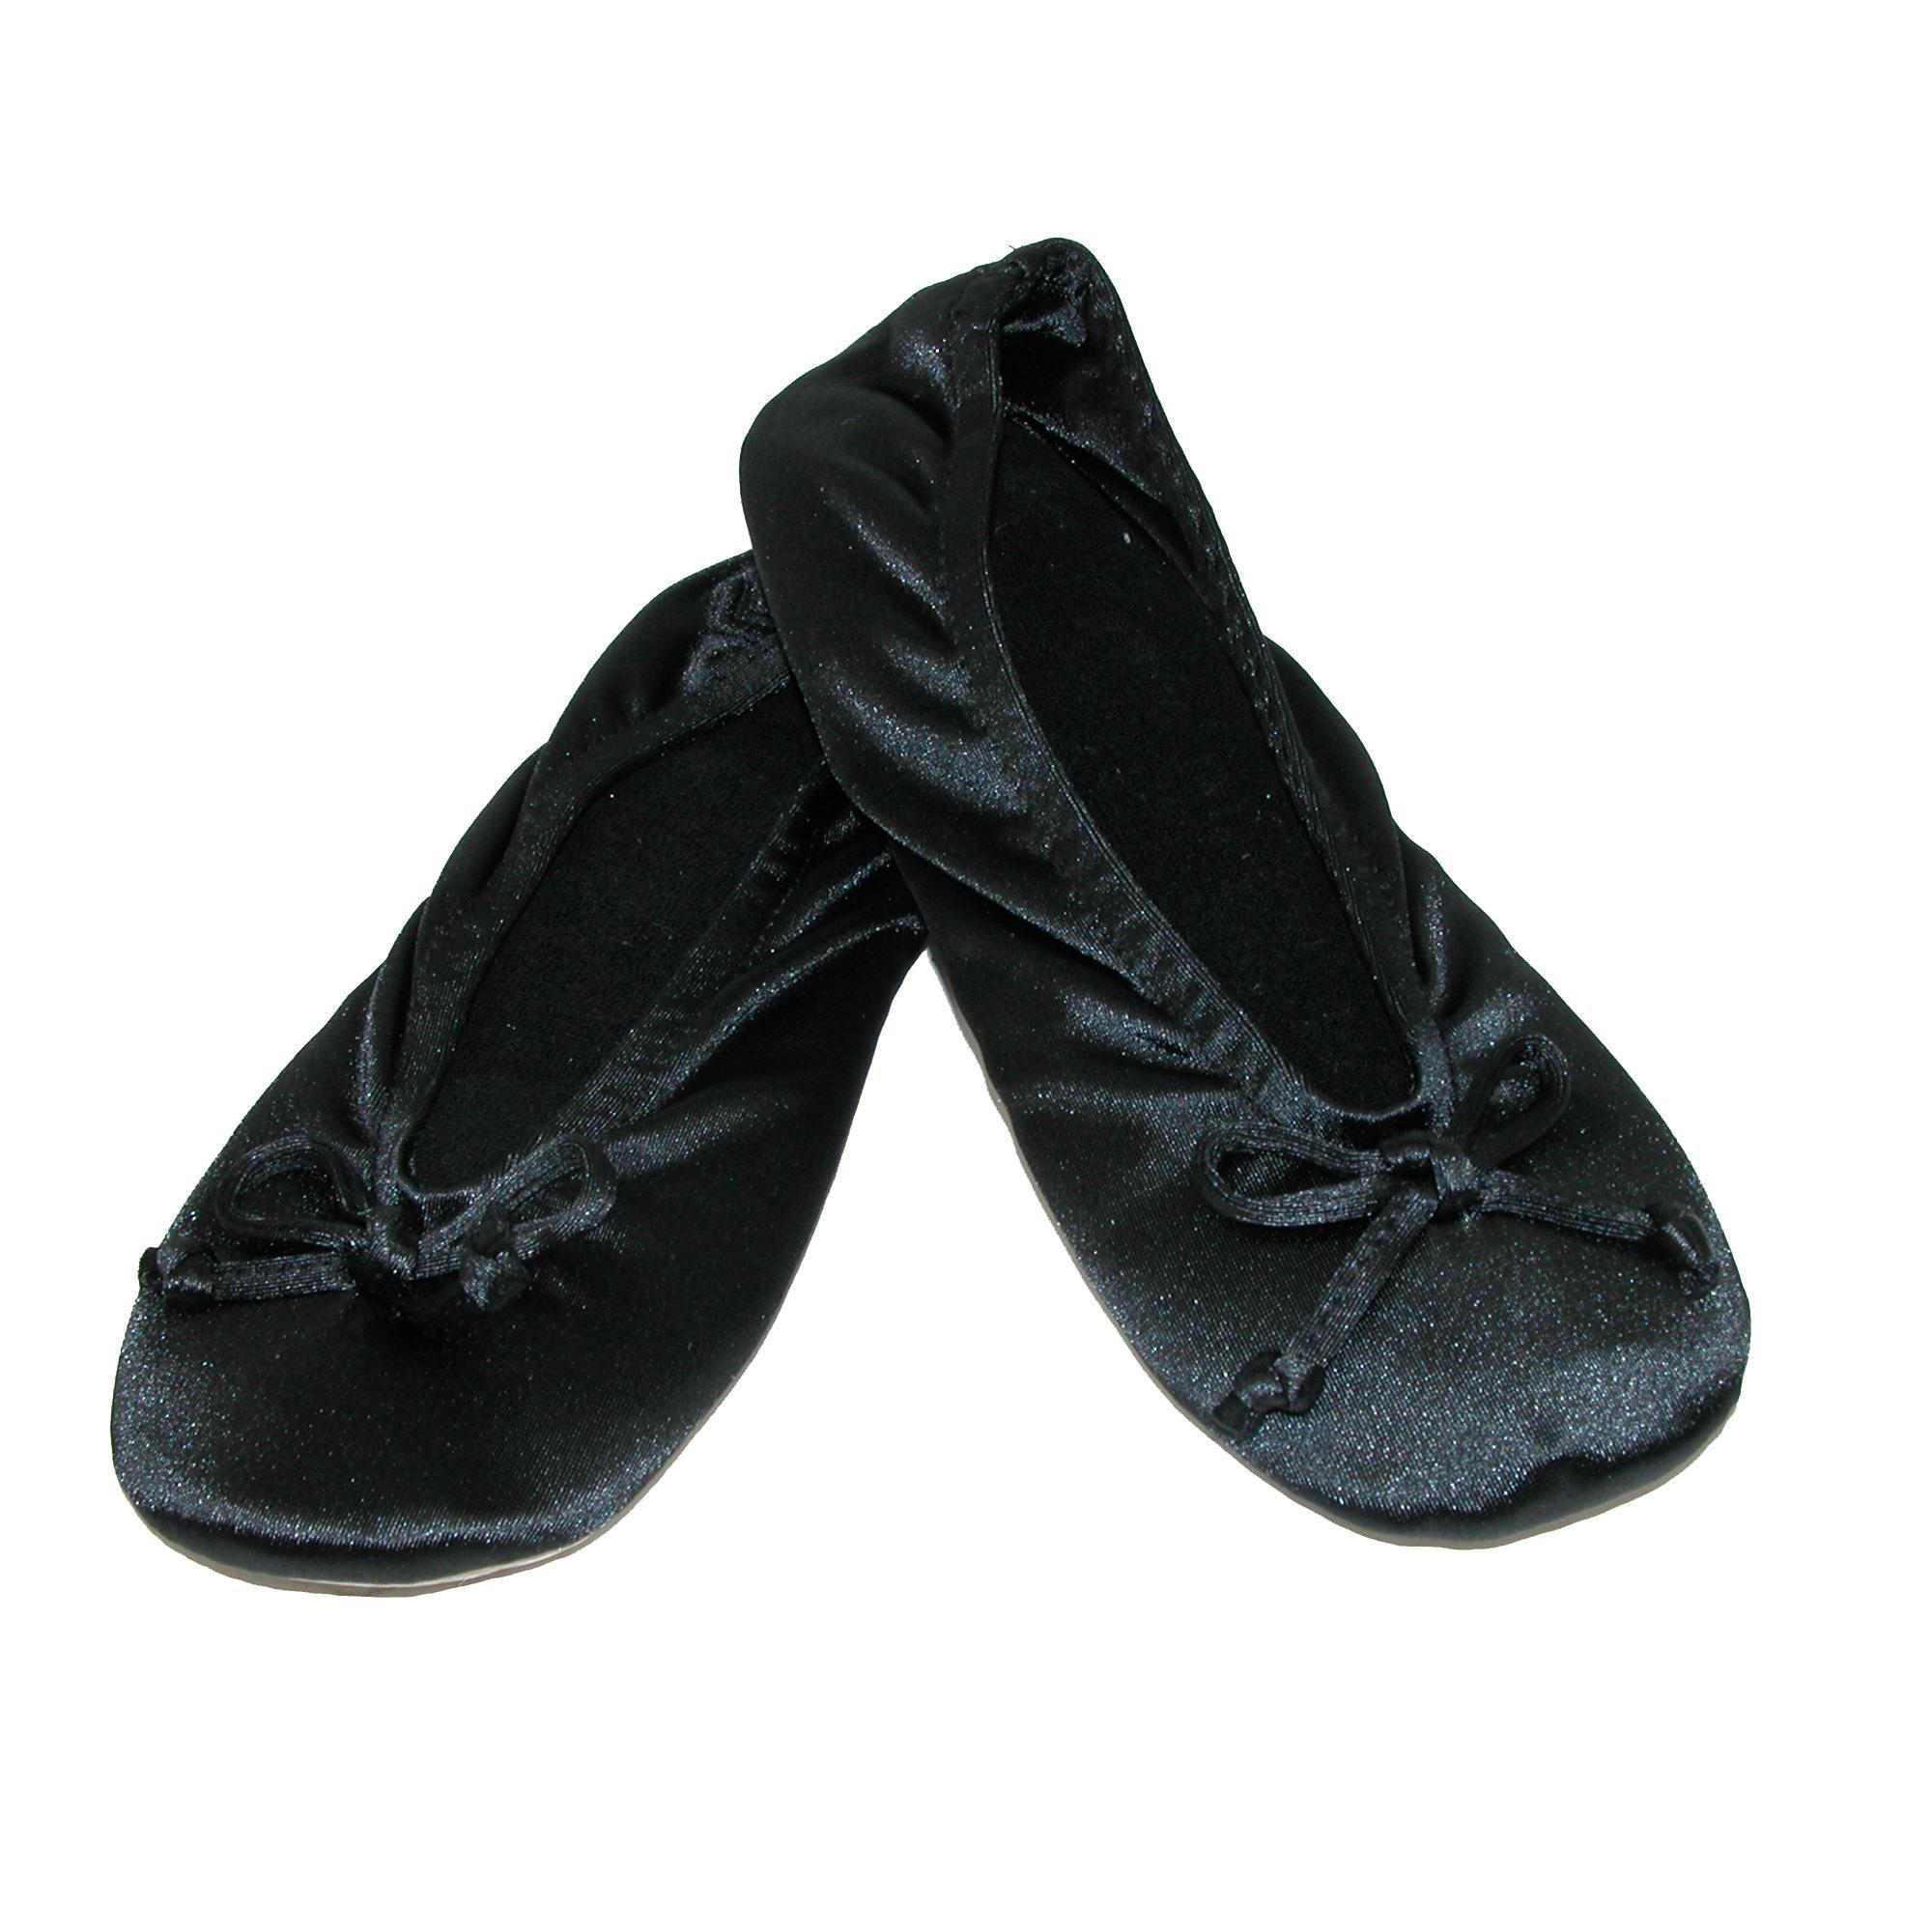 New-Isotoner-Women-039-s-Satin-Classic-Ballerina-Slippers thumbnail 4